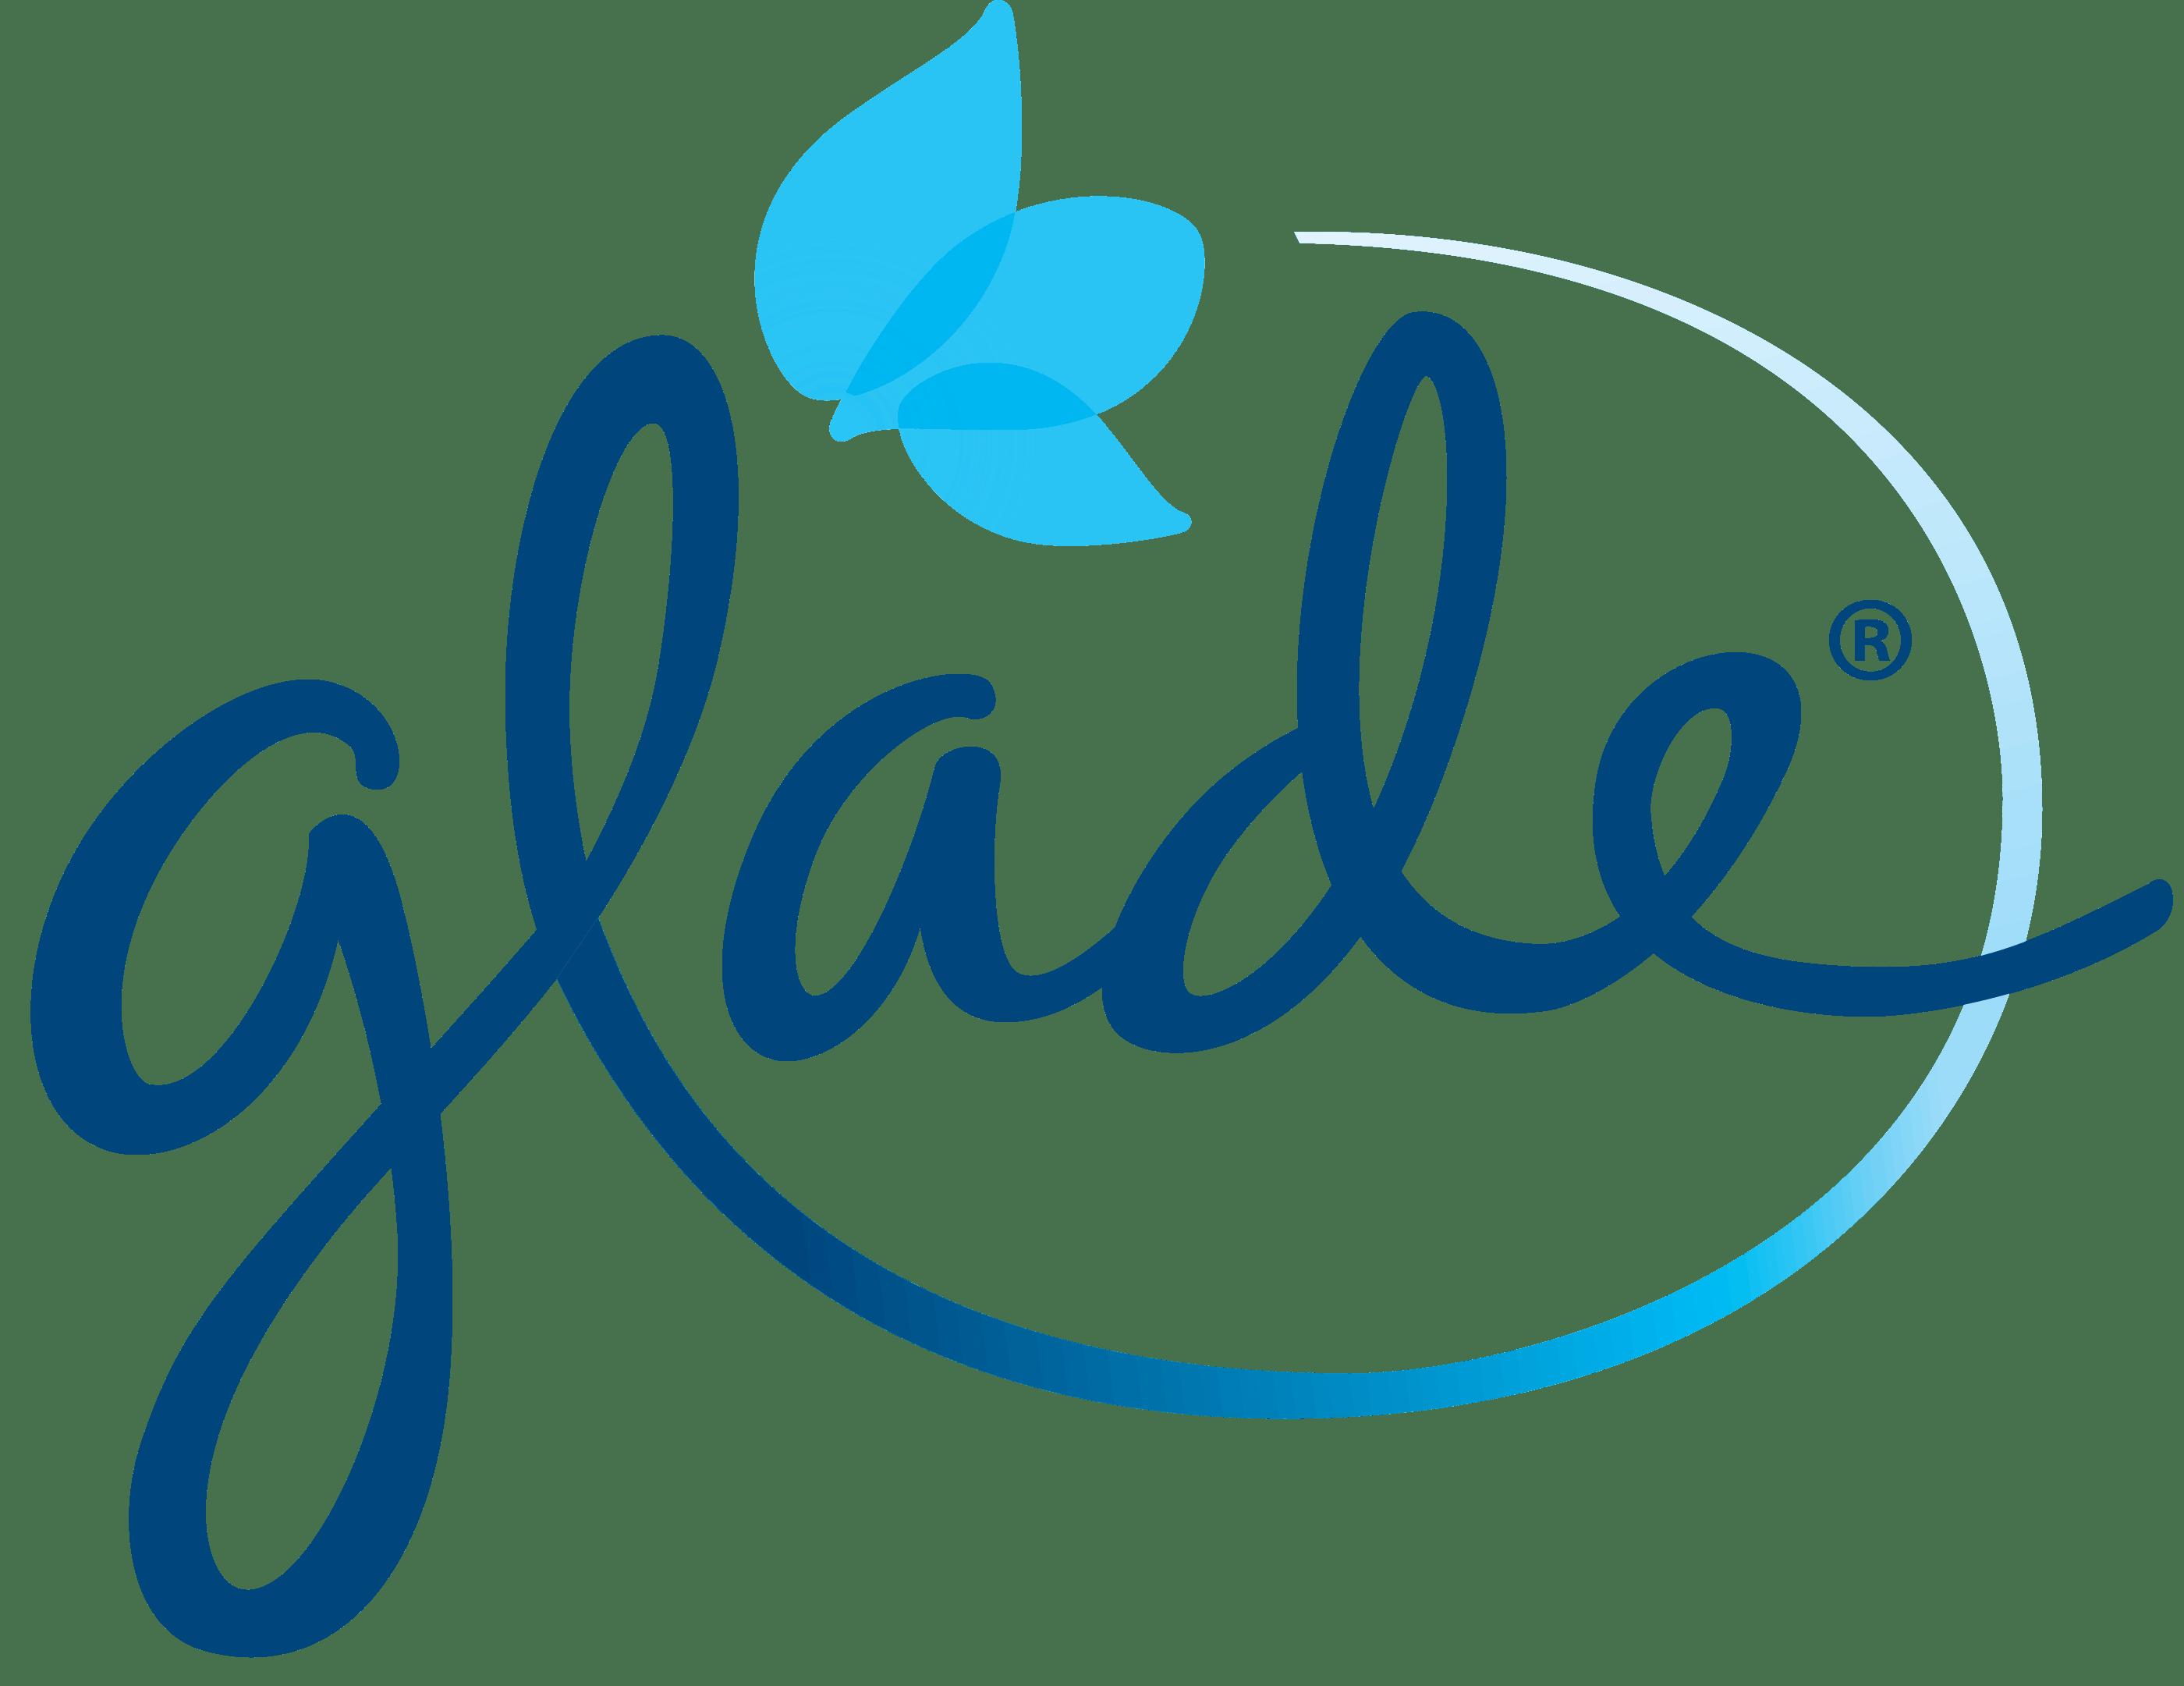 Glade Logo 2014 4c POS LG F 3 211